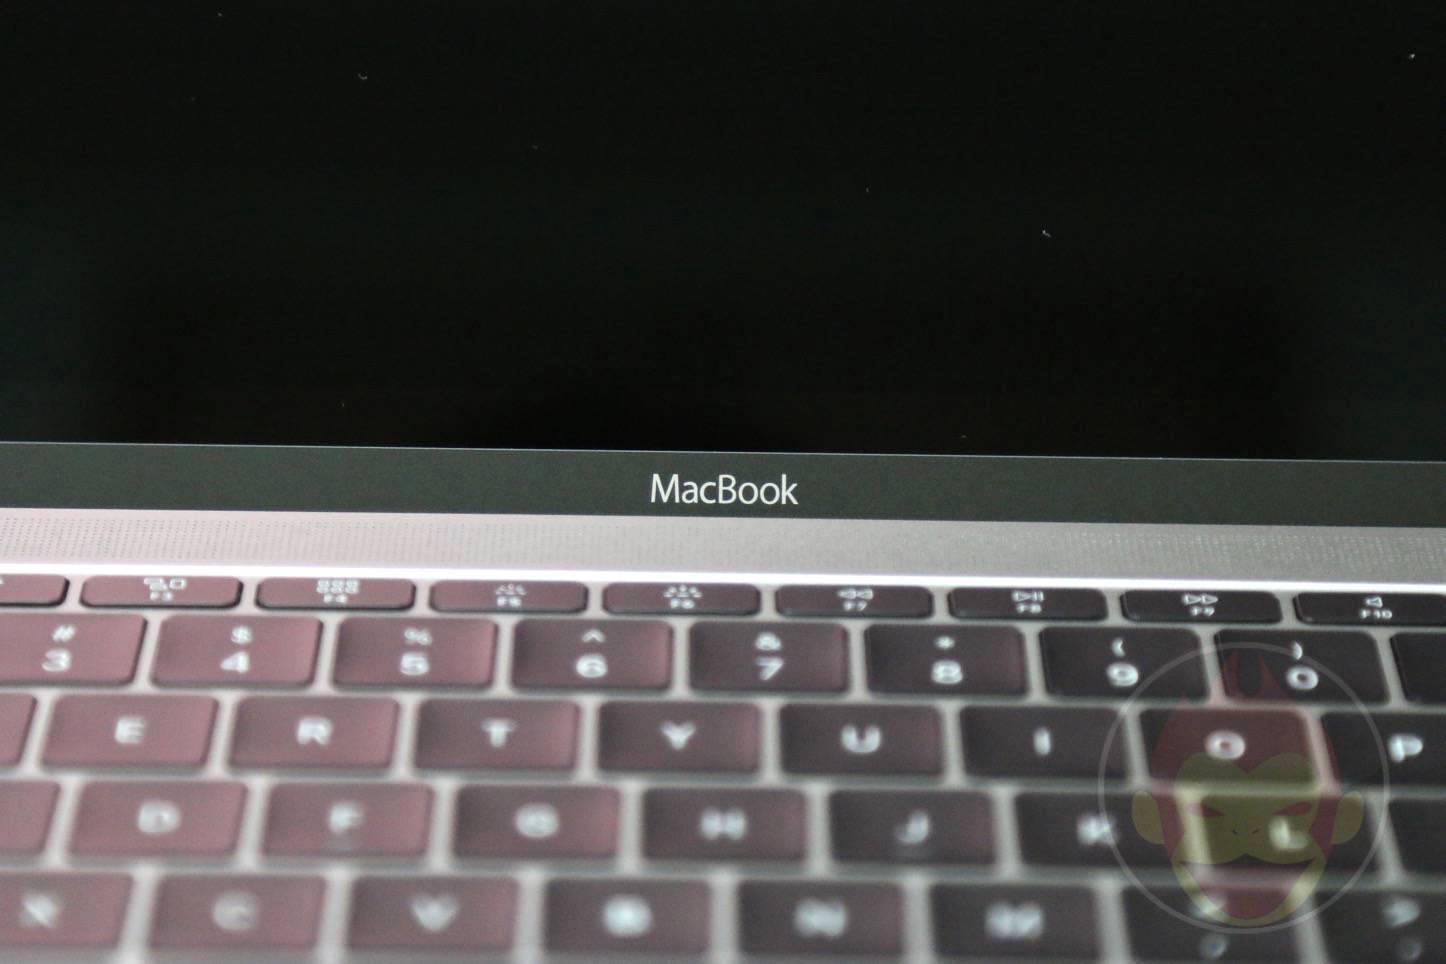 12inch-The-New-MacBook-86.JPG